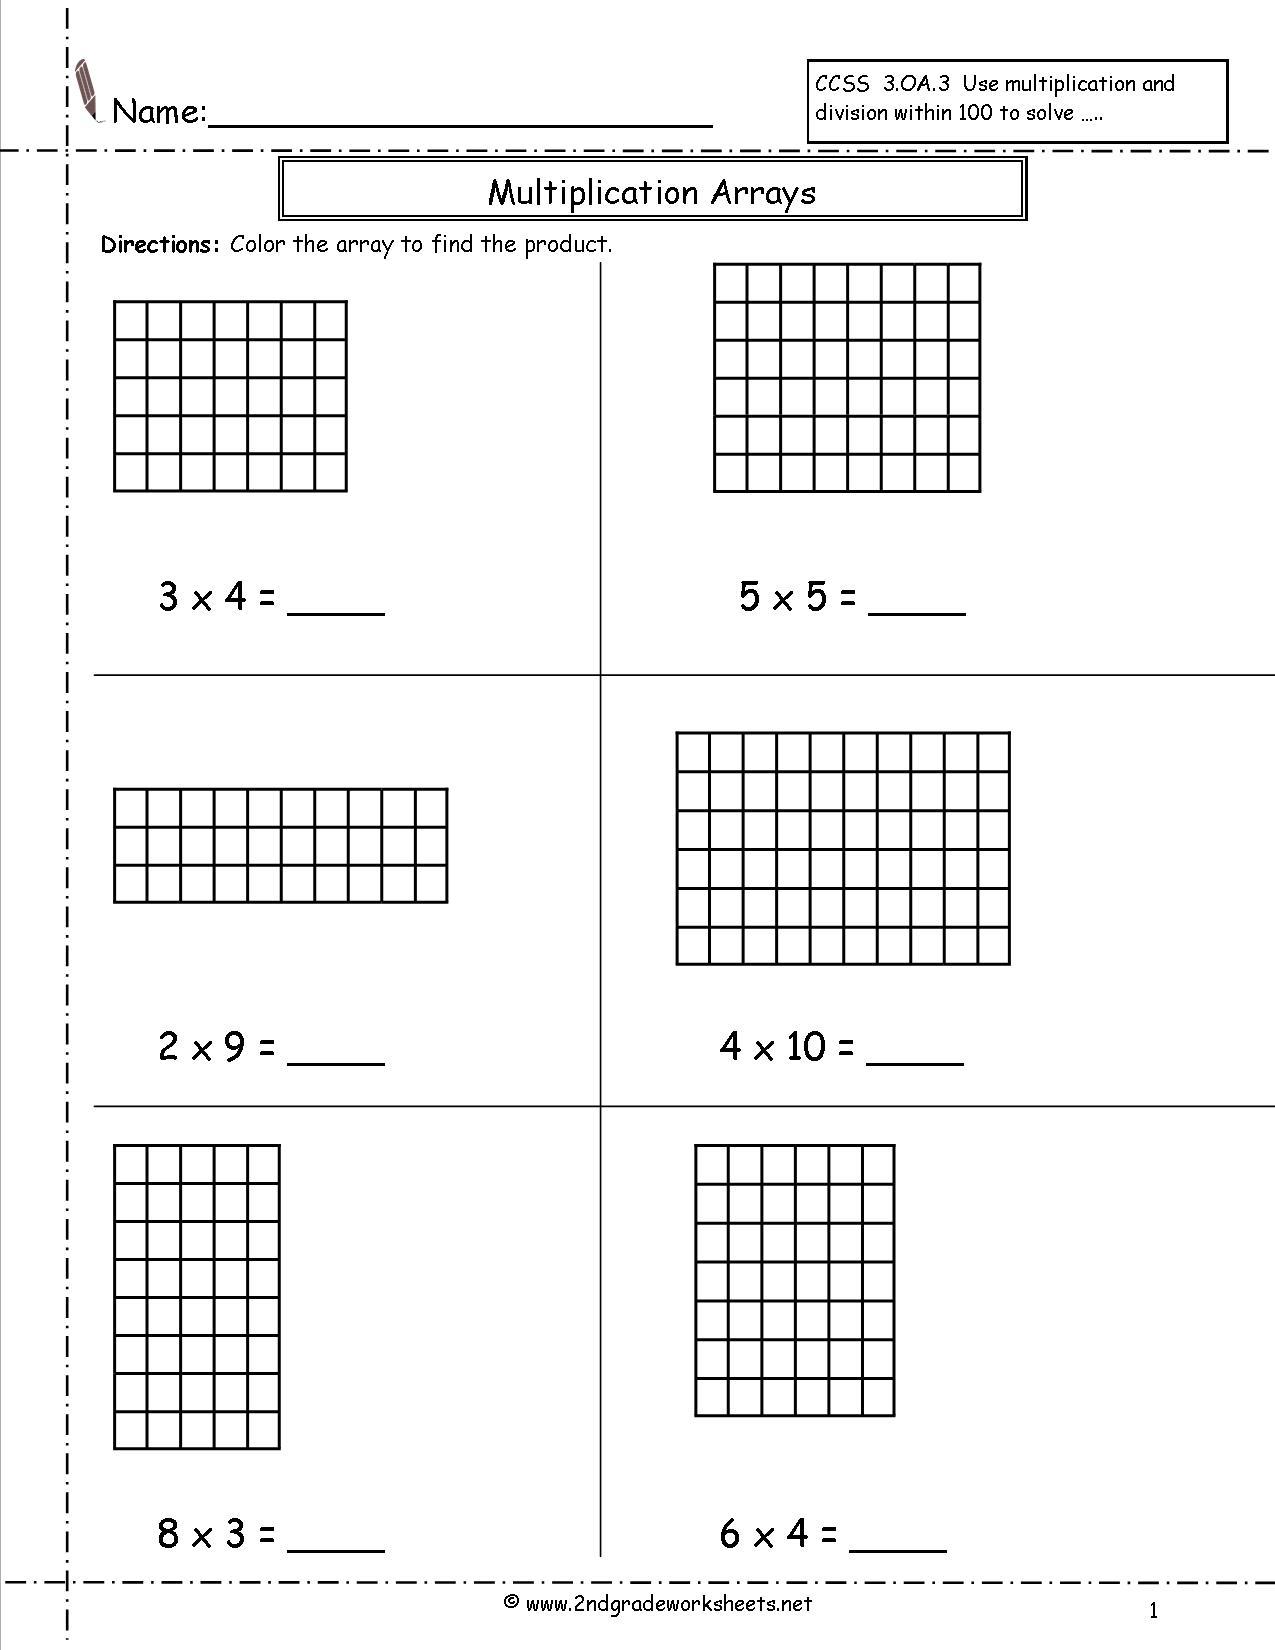 Multiplication Arrays Worksheets Grade 2 1033347